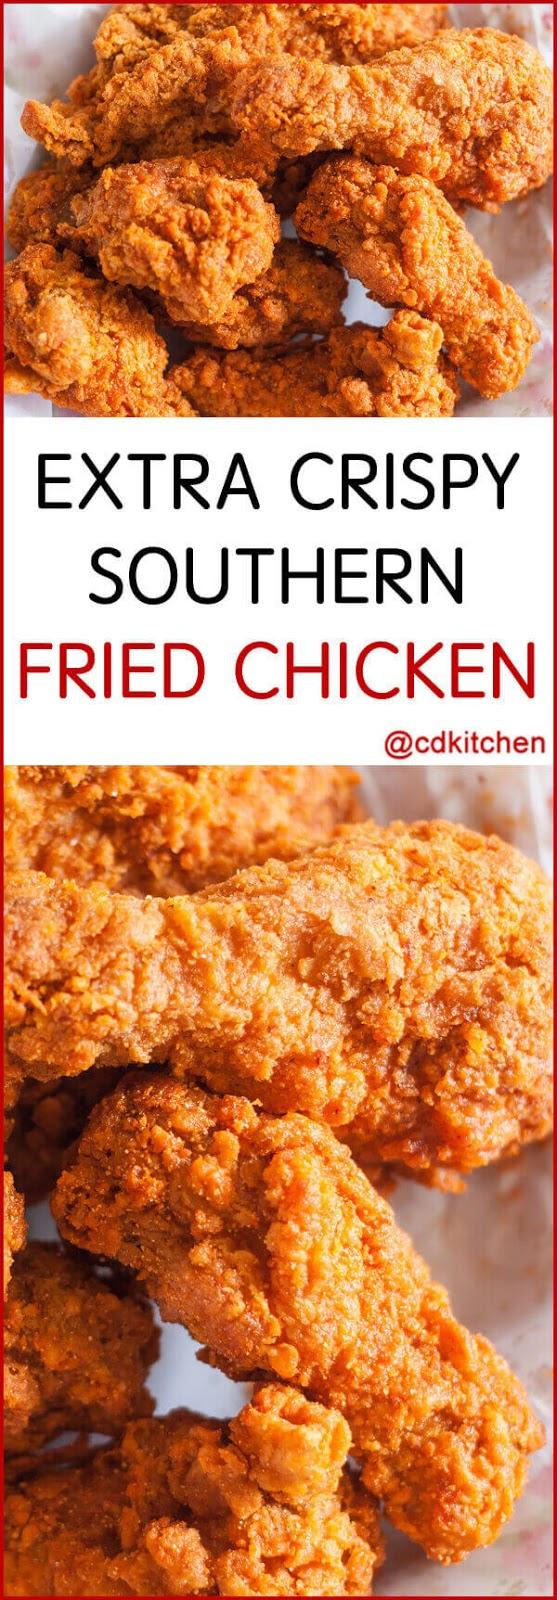 Extra Crispy Southern Fried Chicken